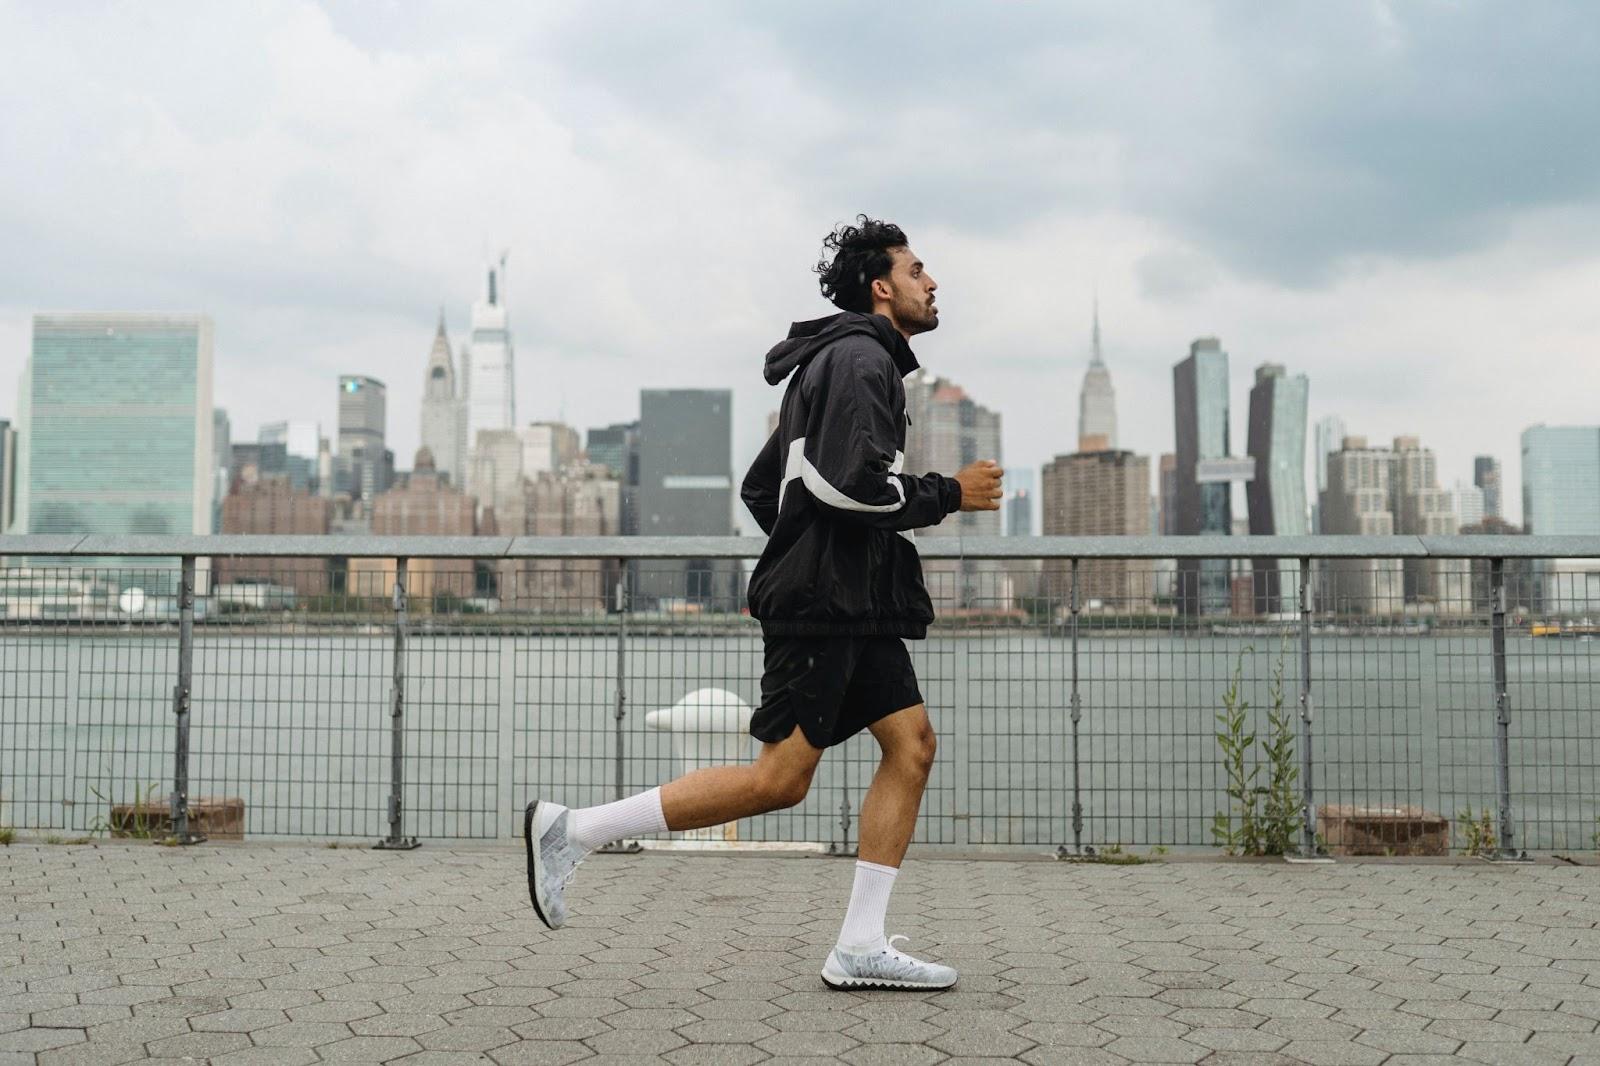 Man running on sidewalk nearby a cityscape.